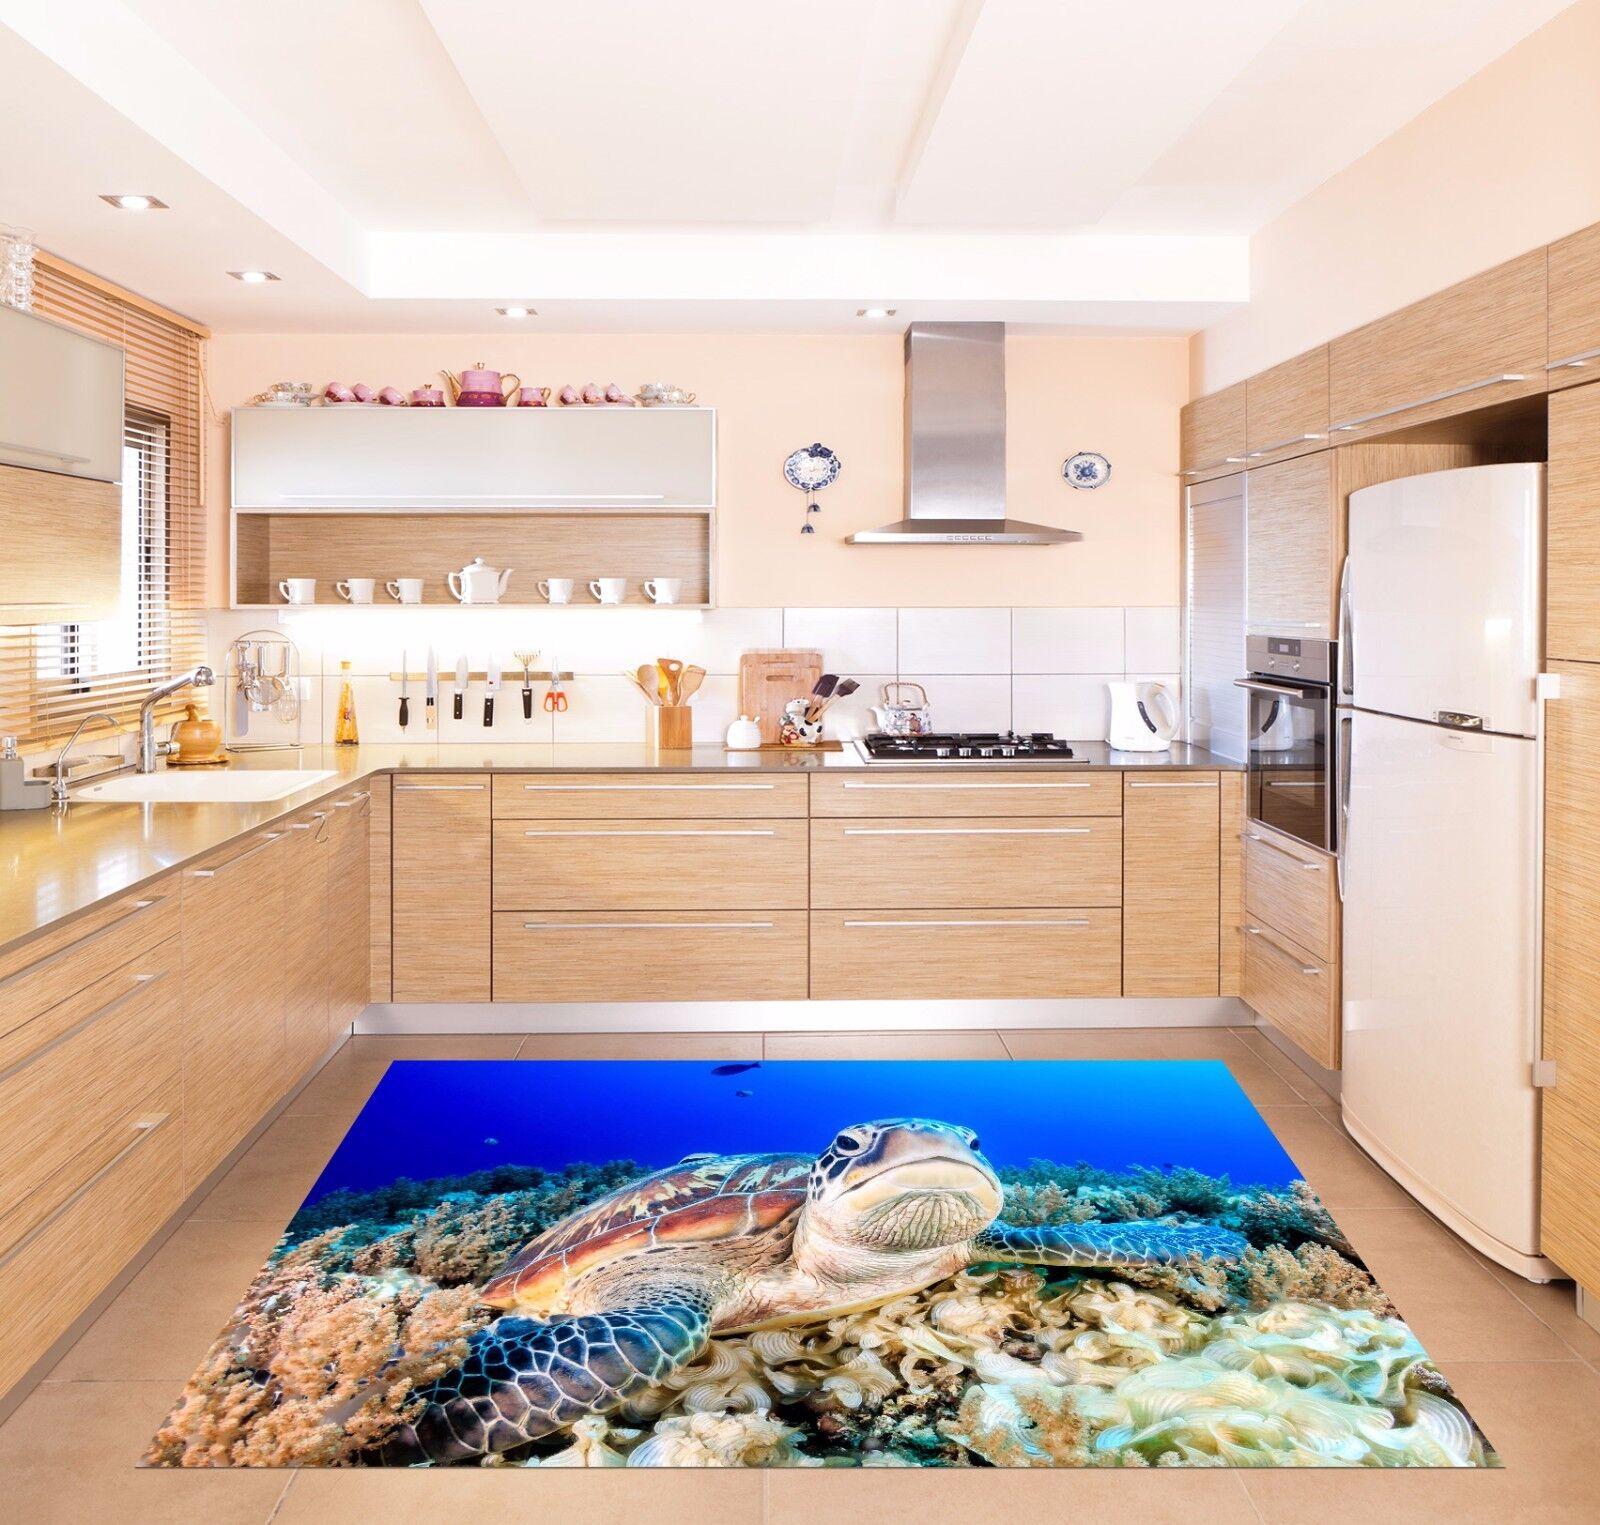 3D Turtles 823 Kitchen Mat Floor Murals Wall Print Wall AJ WALLPAPER UK Kyra